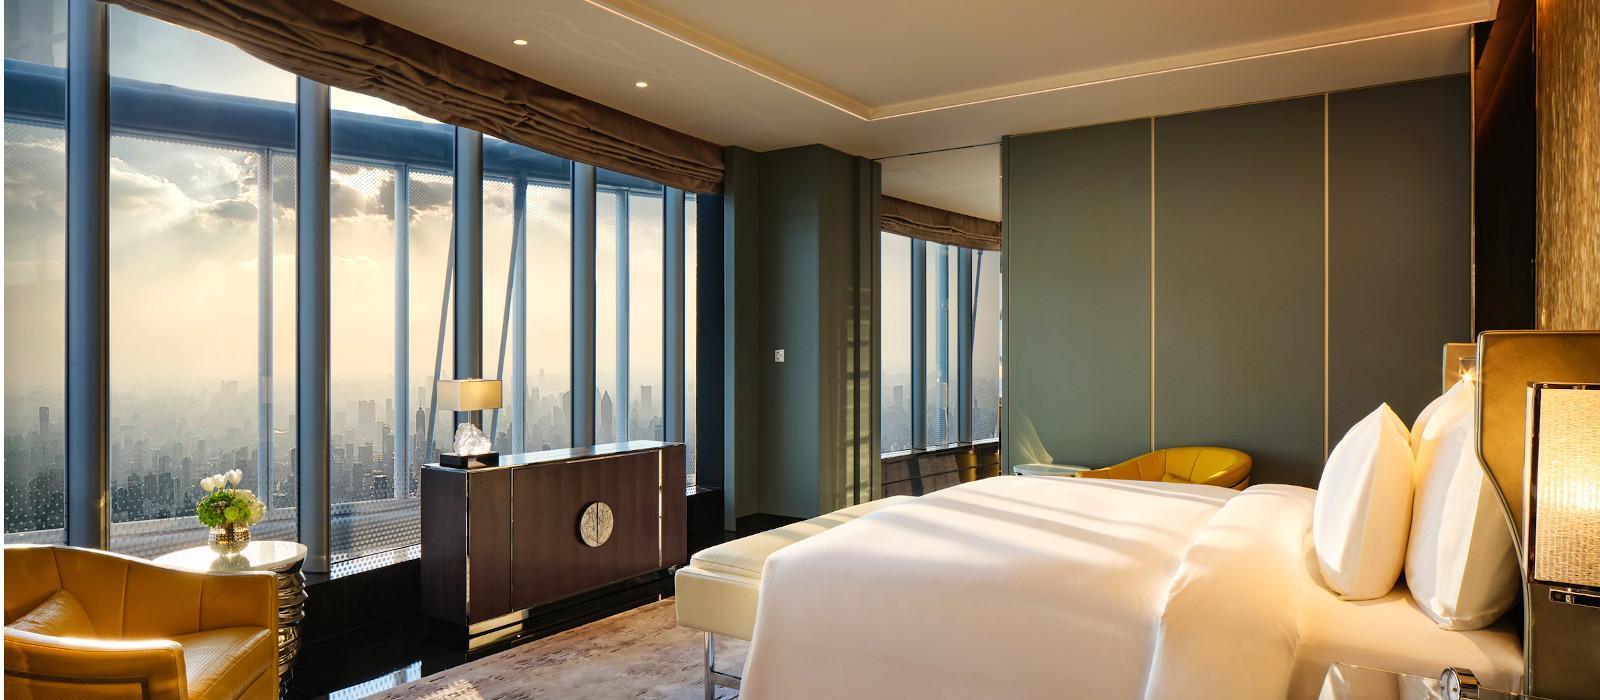 J 酒店上海中心(J Hotel Shanghai Tower)【 上海,中国】 酒店  www.lhw.cn